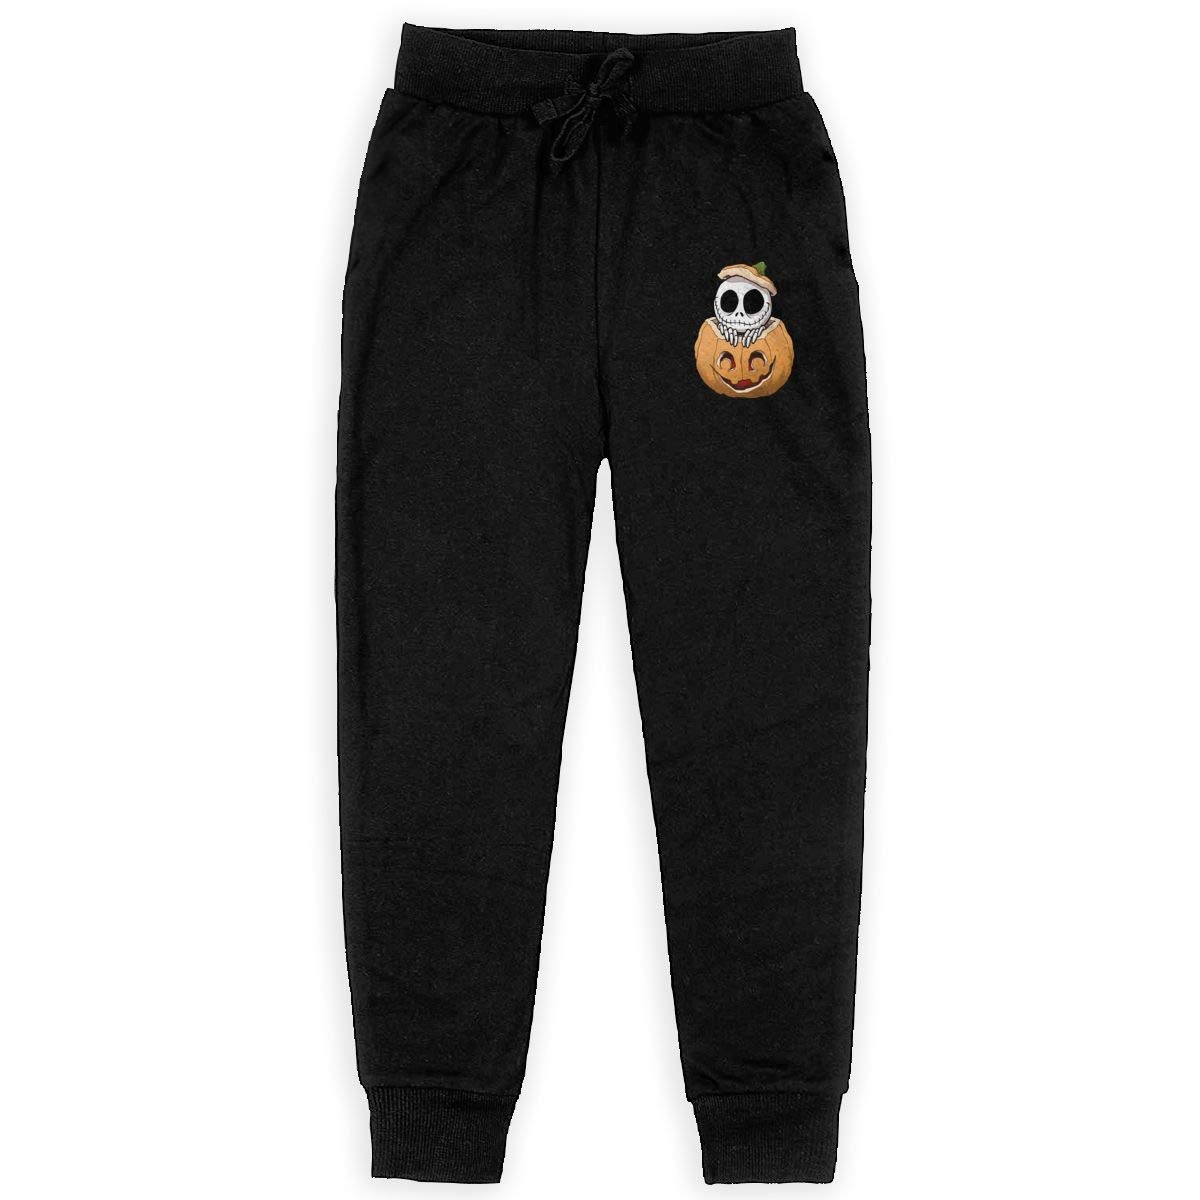 Kim Mittelstaedt Pumpkin King Boys Big Active Basic Casual Pants Sweatpants for Boys Black